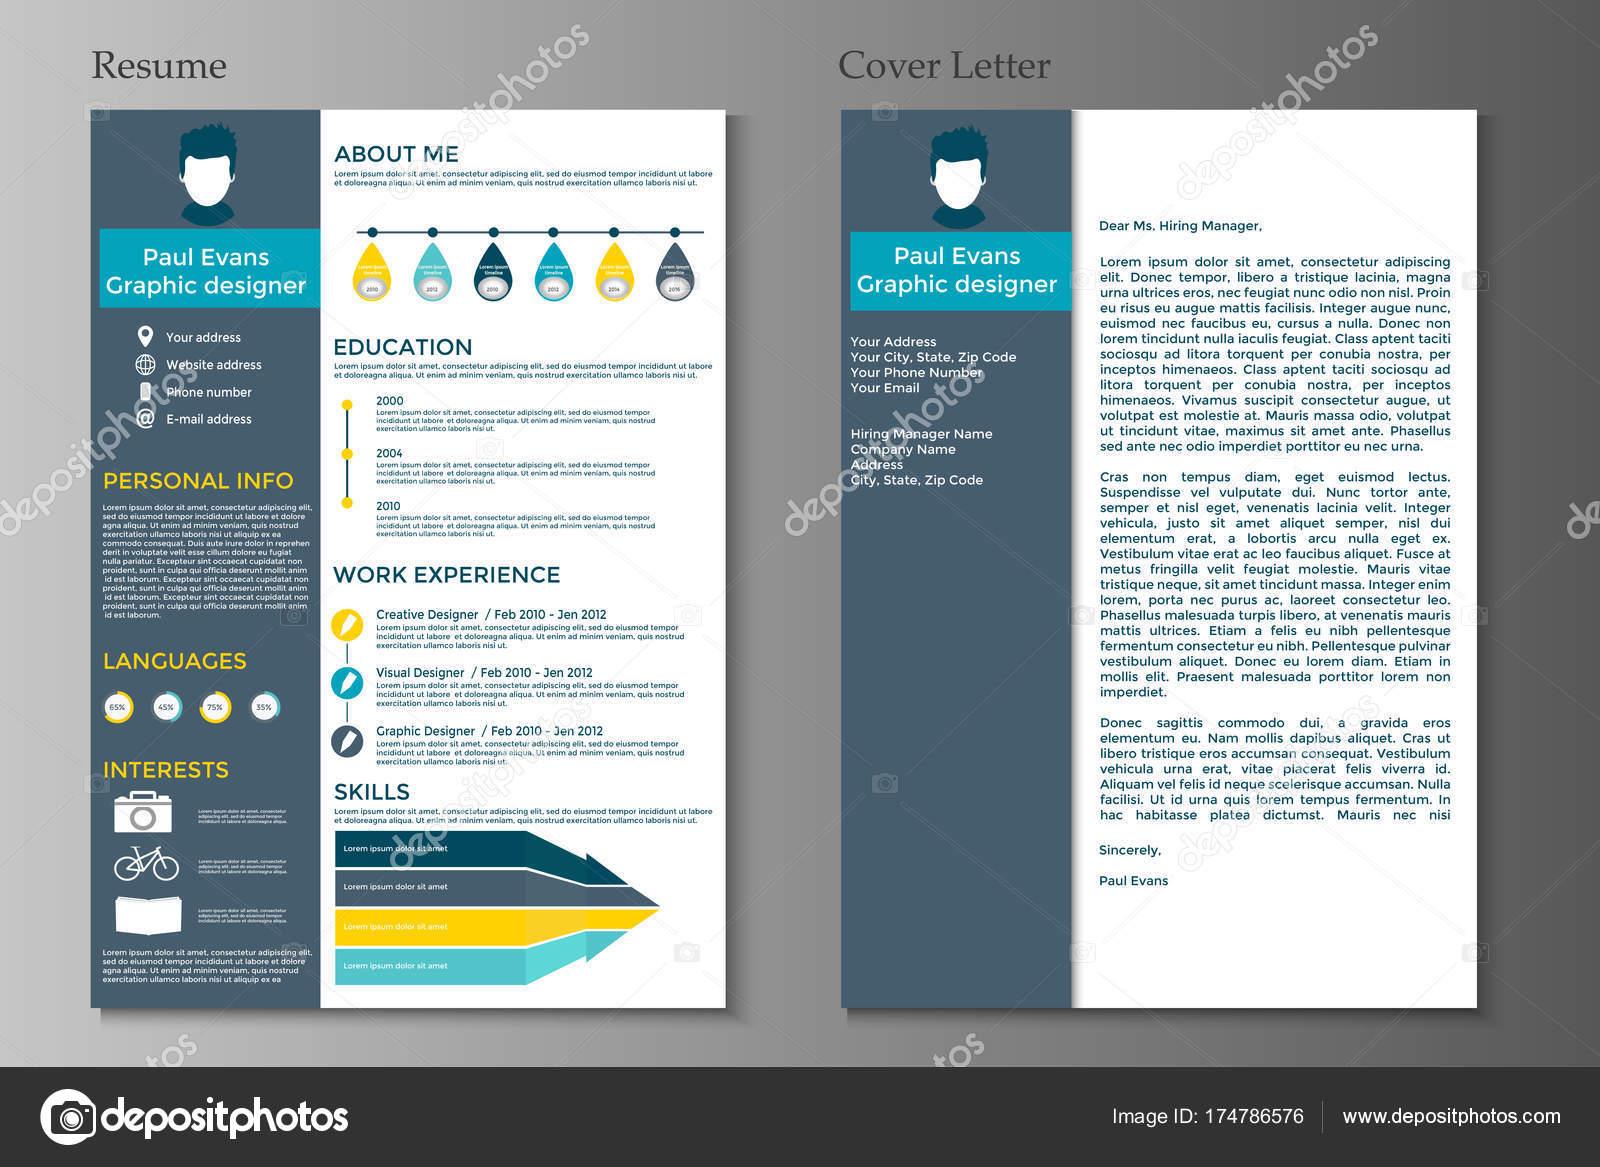 Curriculum Vitae Carta Presentación Diseño Estilo Plano Sobre Fondo ...